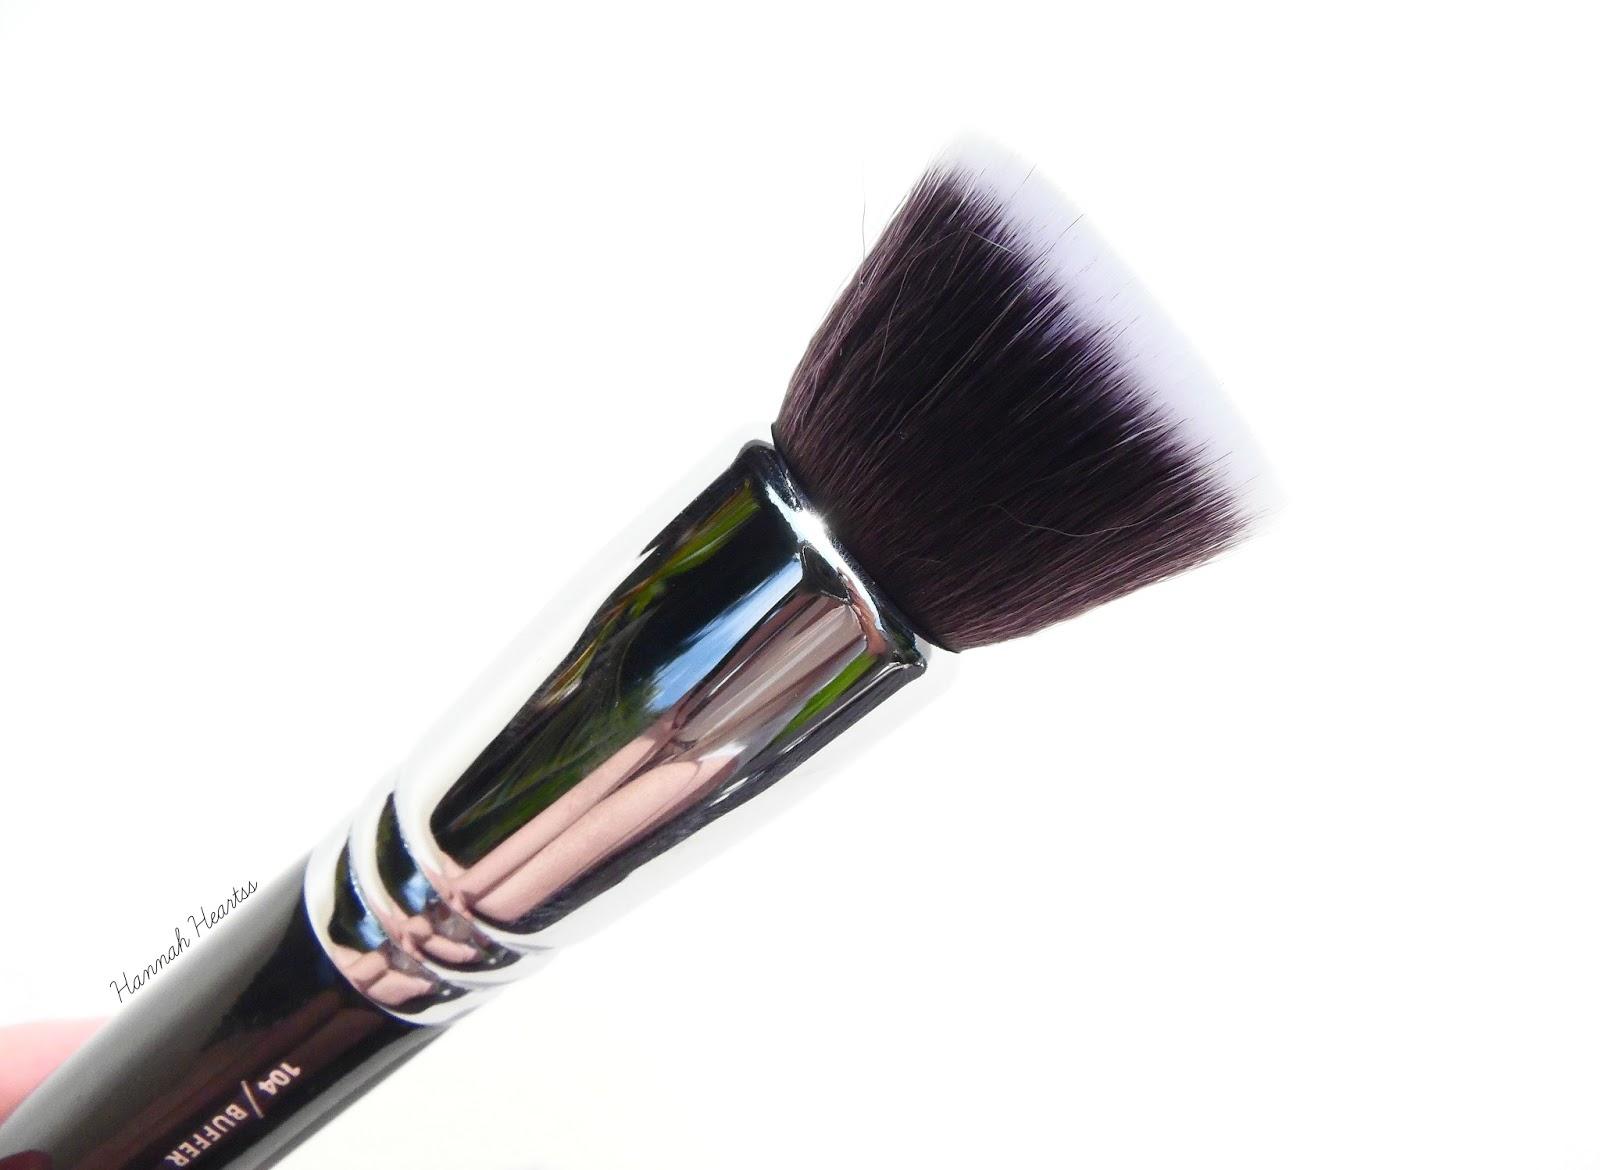 Zoeva 104 Buffer Brush Review